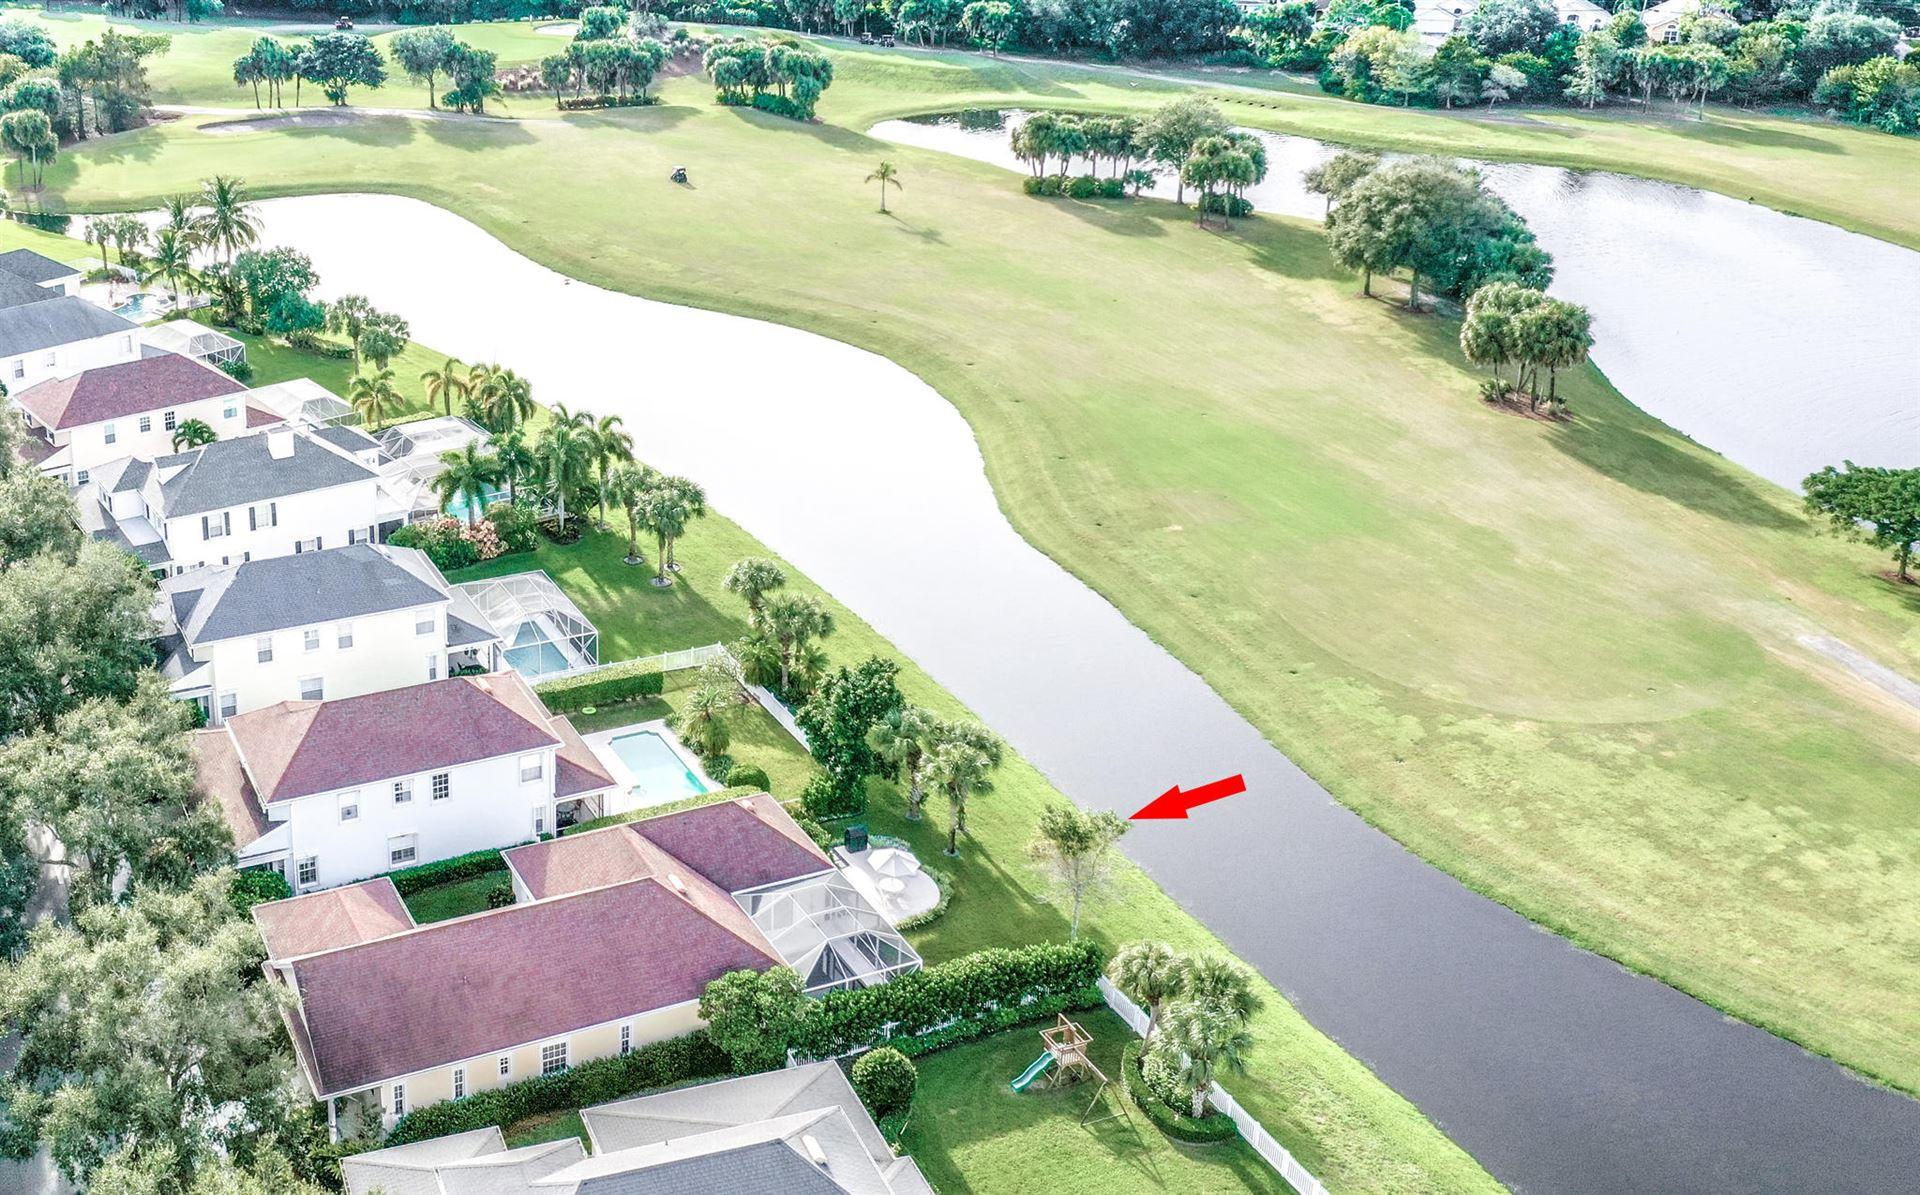 Photo of 156 Barbados Drive, Jupiter, FL 33458 (MLS # RX-10630573)